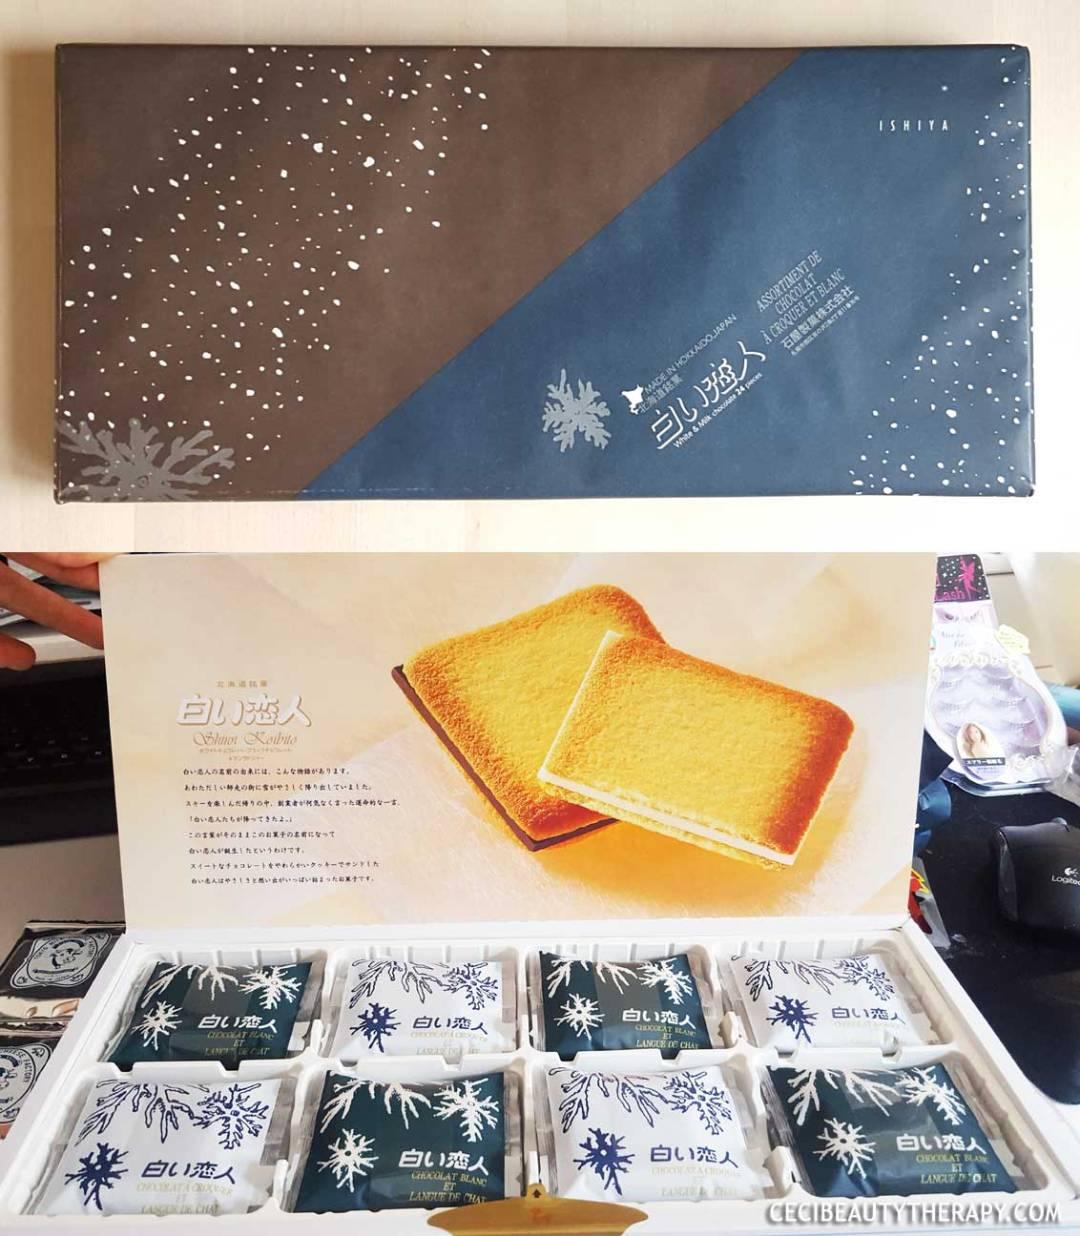 Hokkaido Milk Cookies, Ishiya Shiroi Kobito